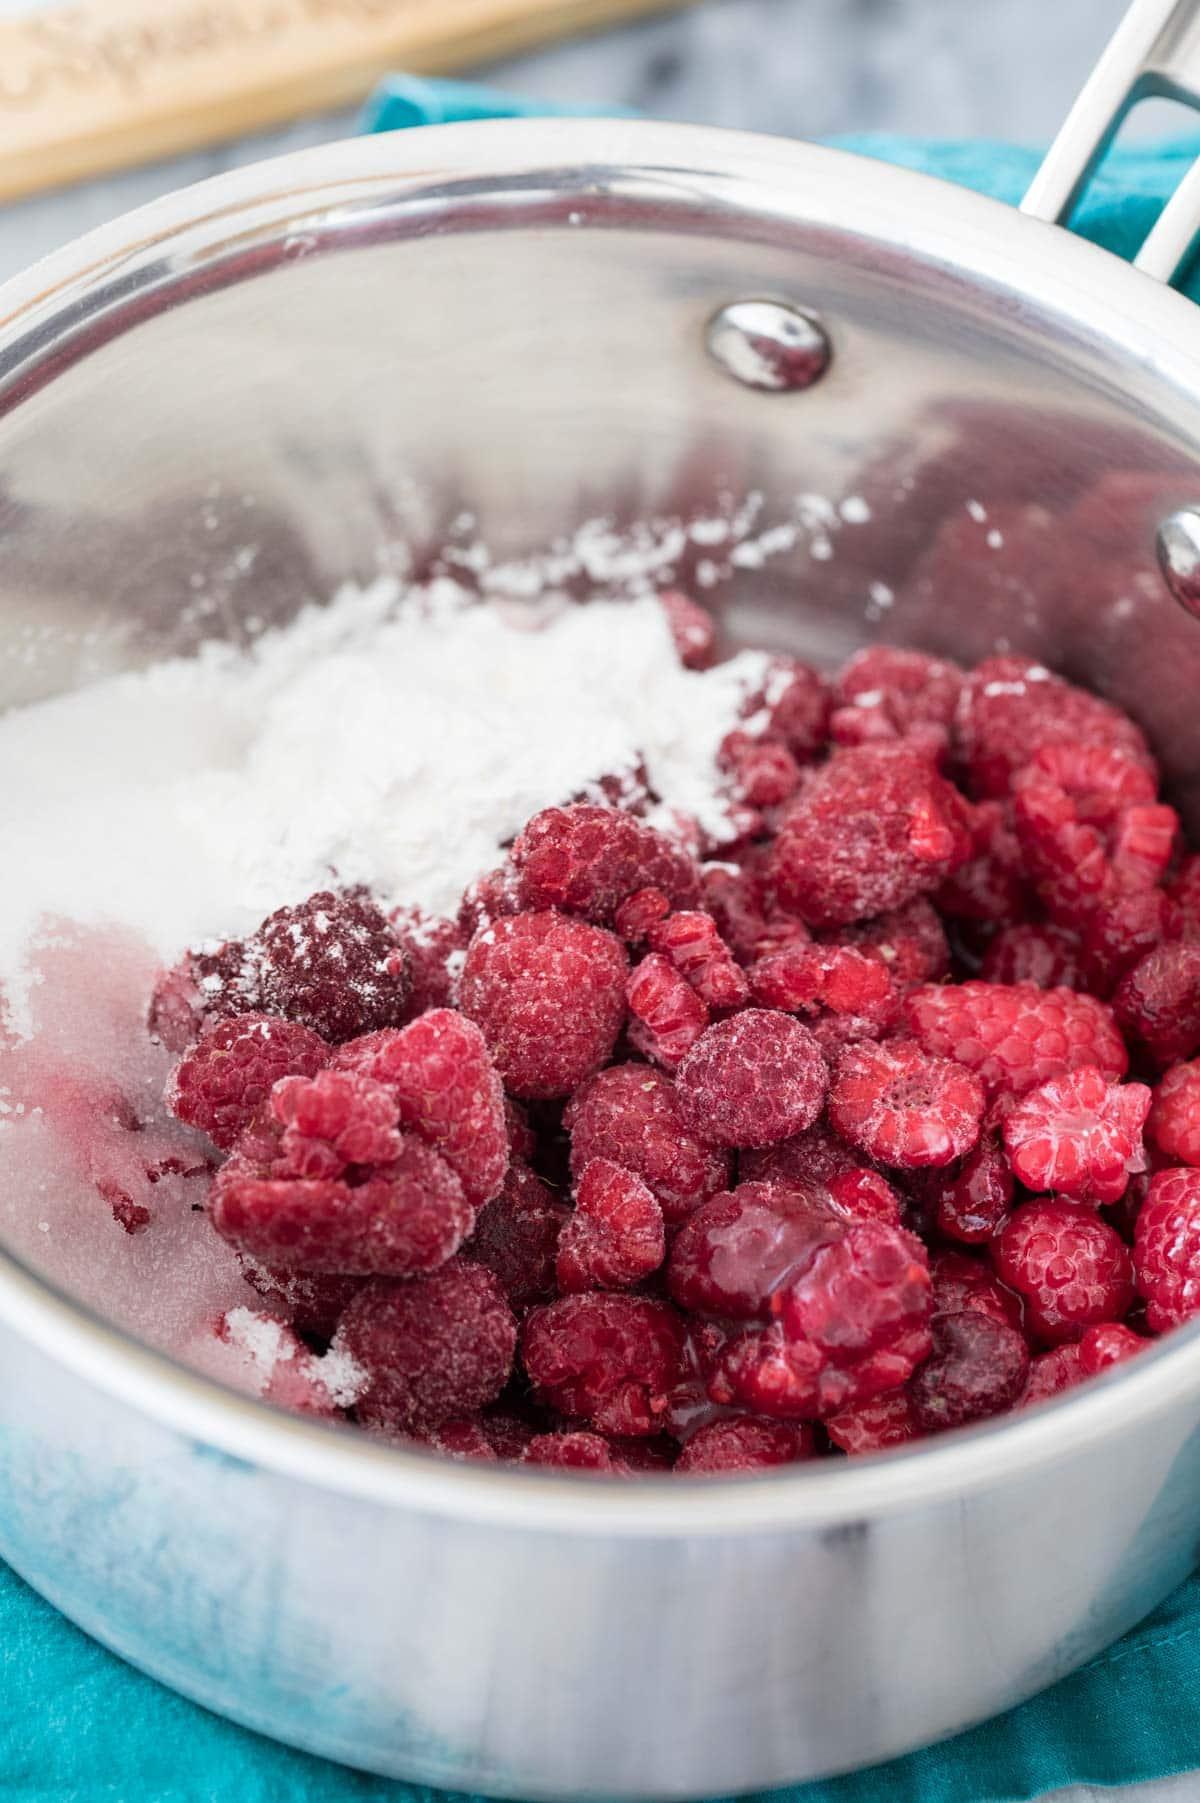 raspberries and sugar in silver-colored saucepan